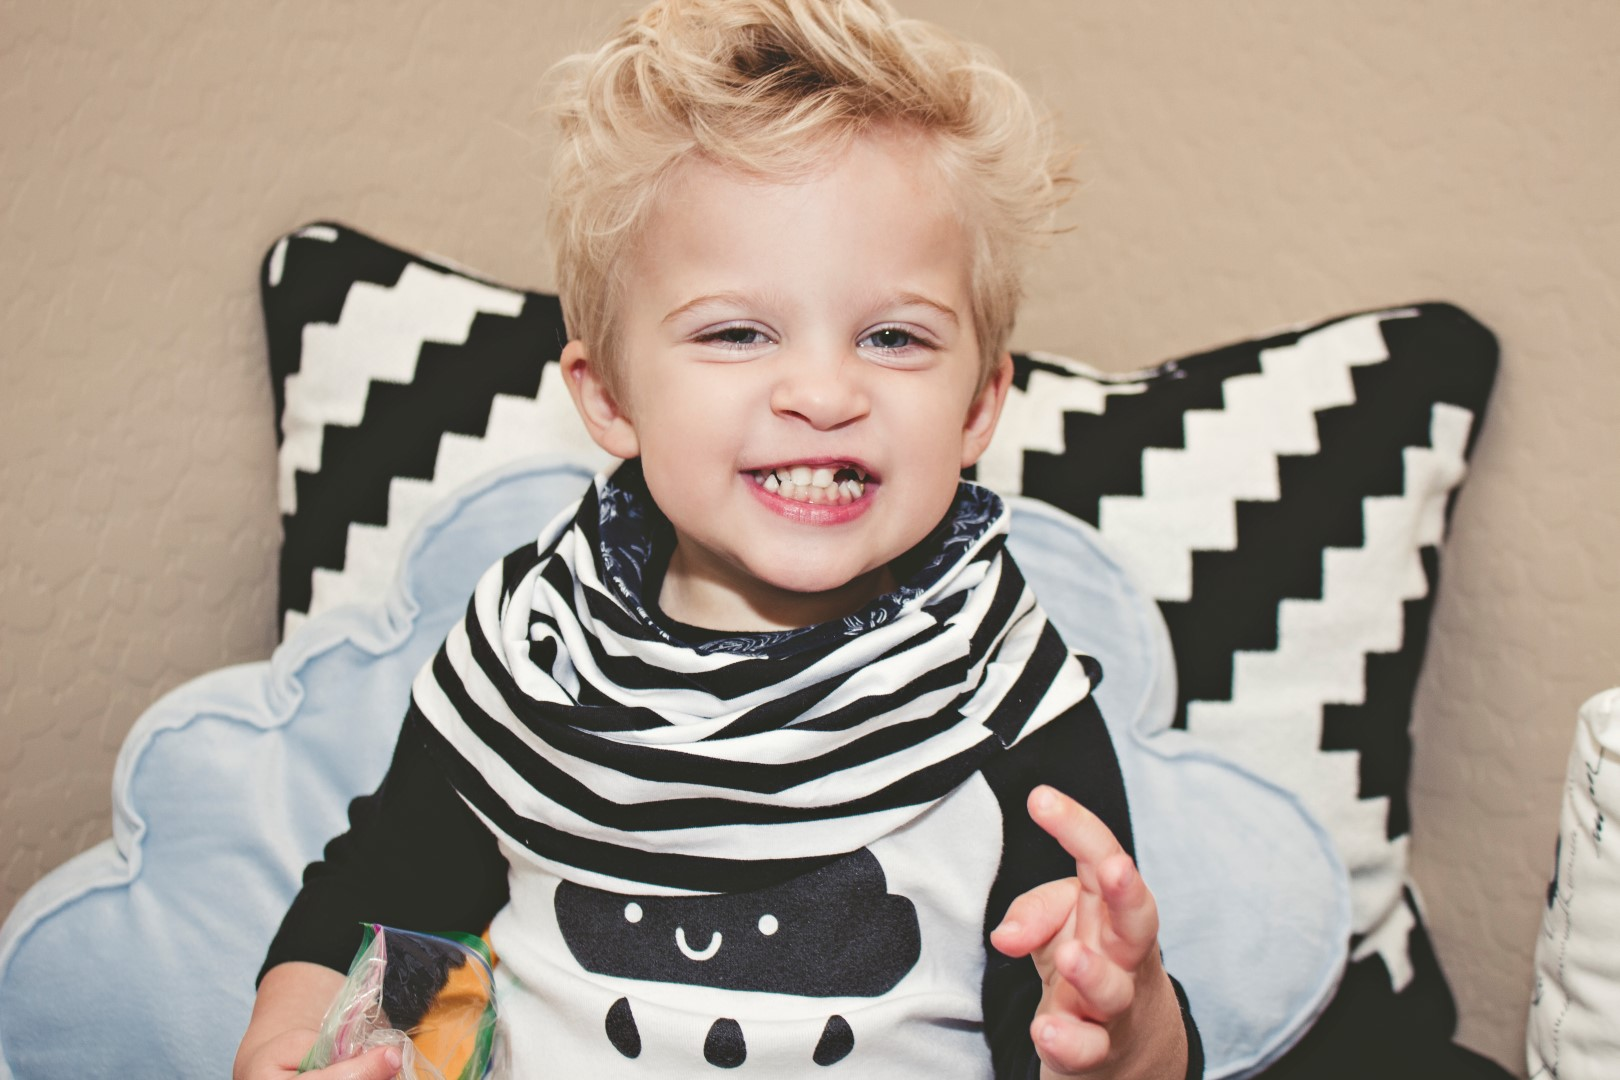 Toddler Fashion #OOTD HugMeSew Dudley Denim Whistle & Flute